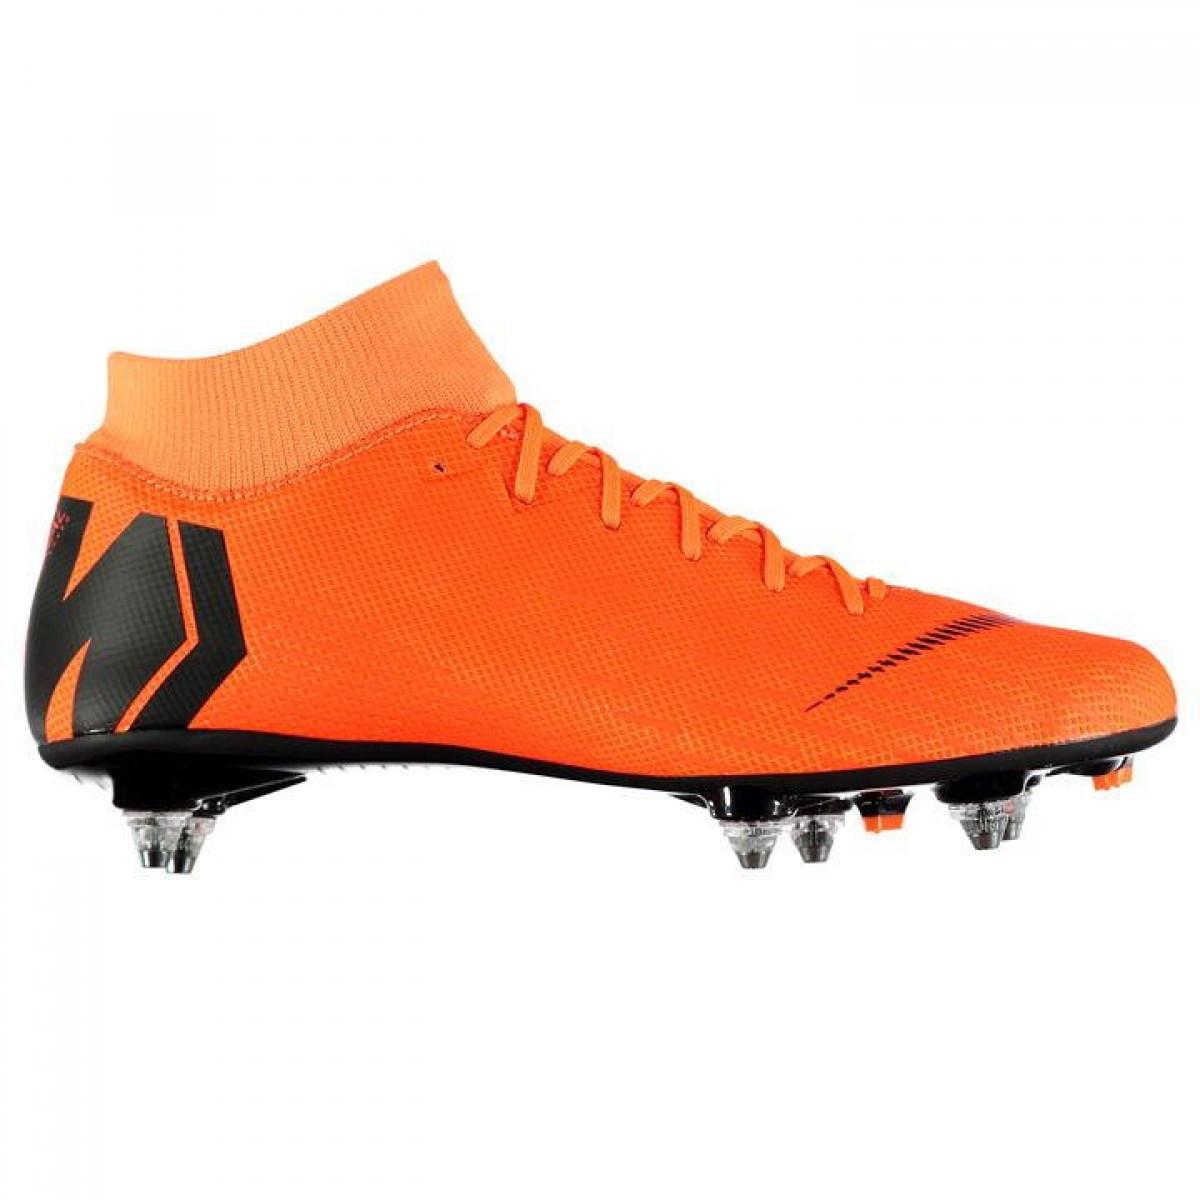 18be2a42 Бутсы Nike Mercurial Superfly Academy SG Orange/Black - Оригинал — в ...